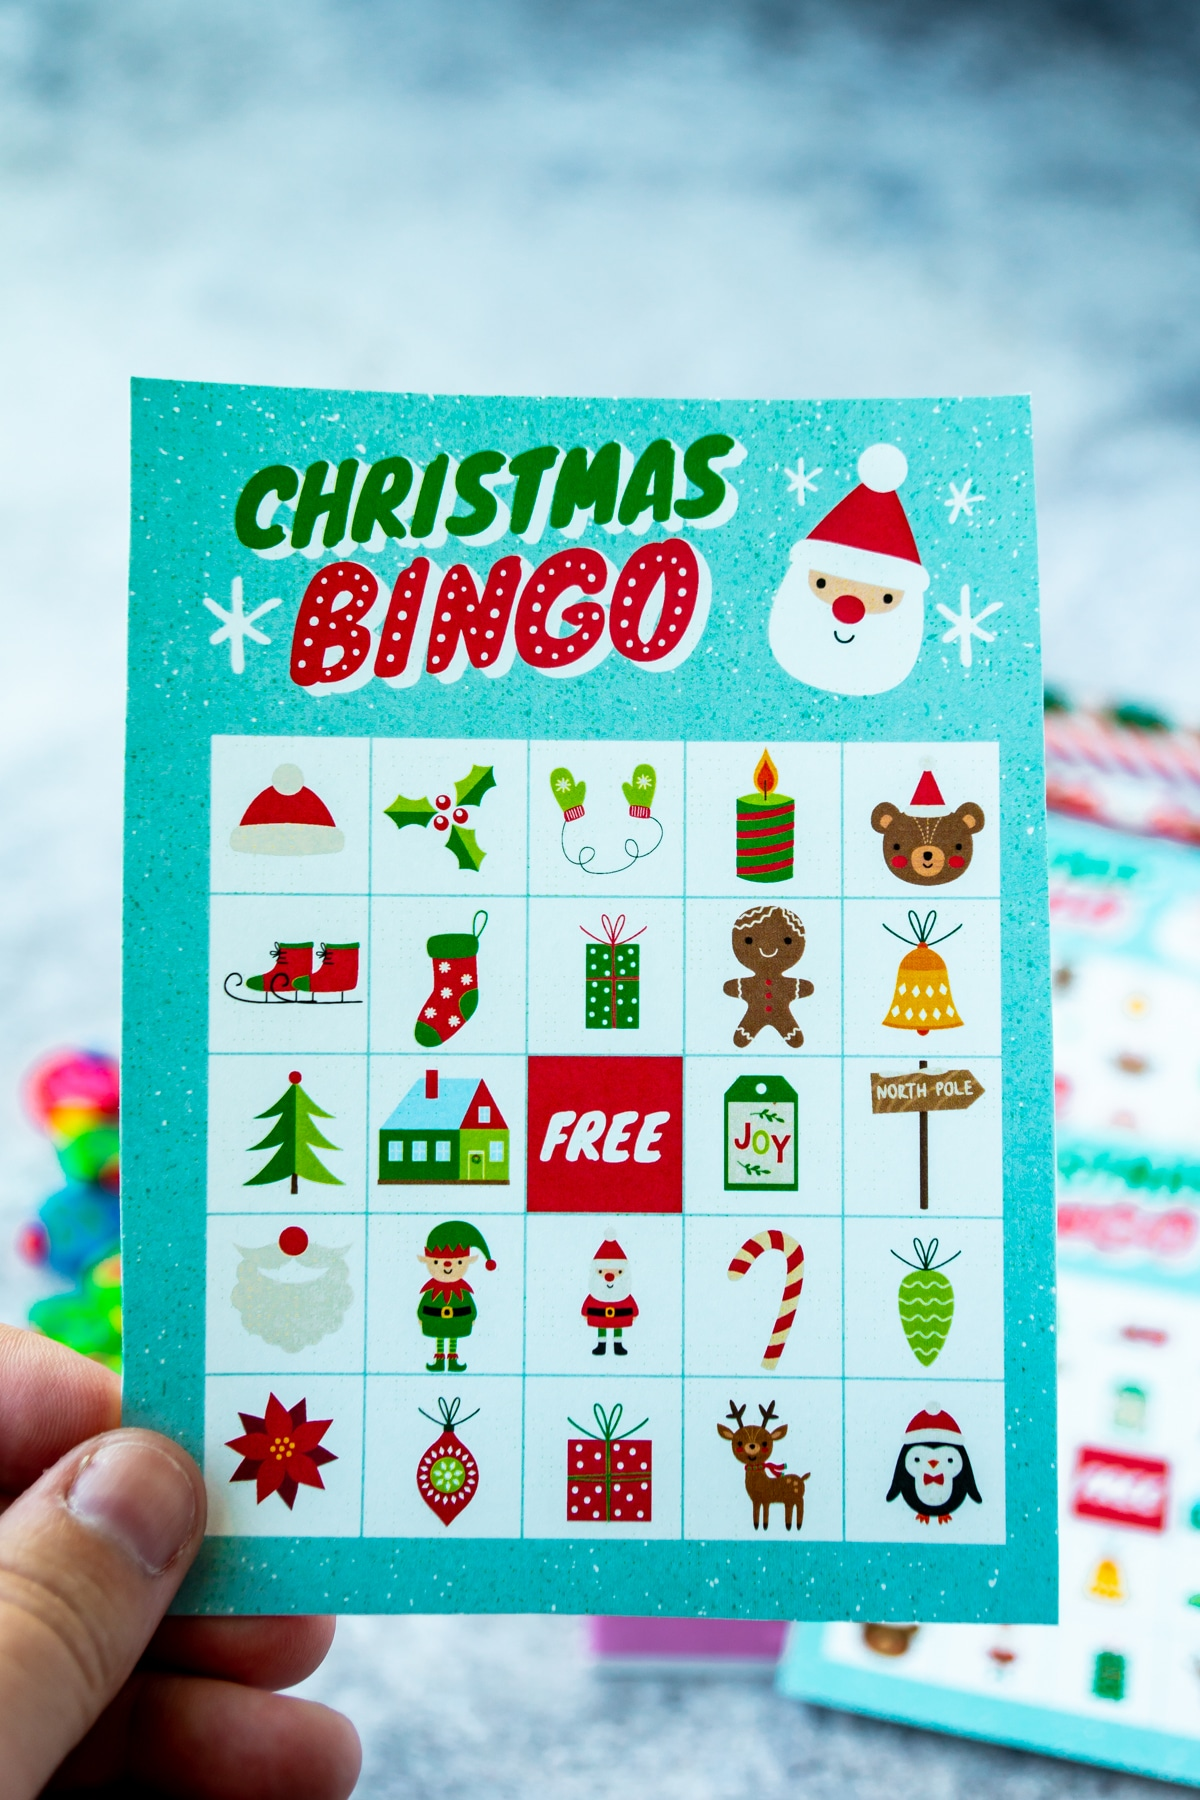 Woman's hand holding a Christmas bingo card